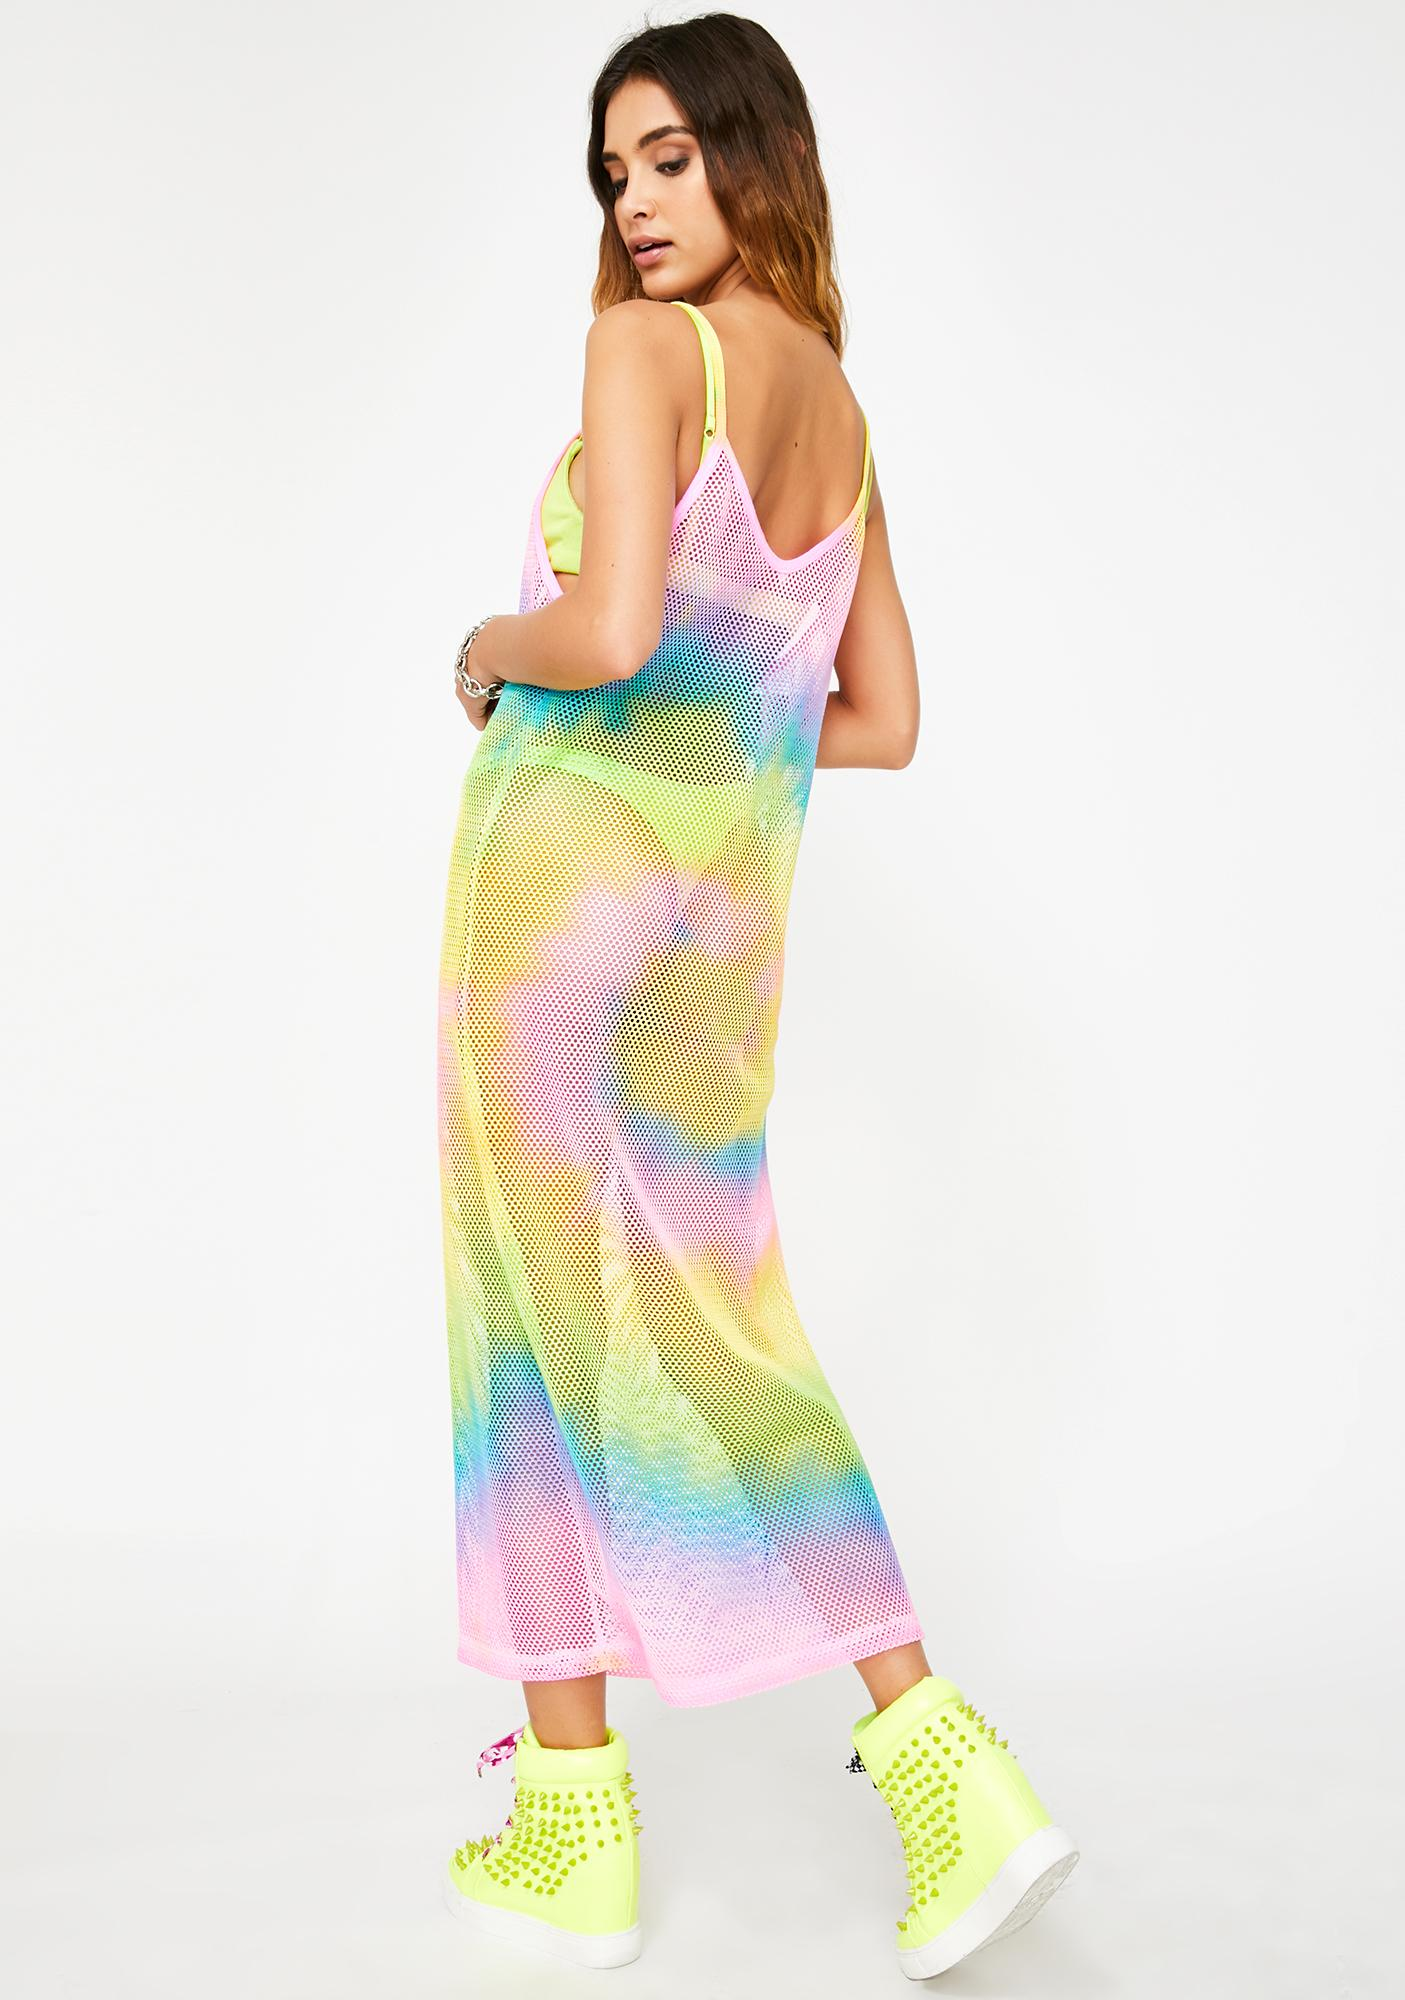 Take The Bait Fishnet Dress